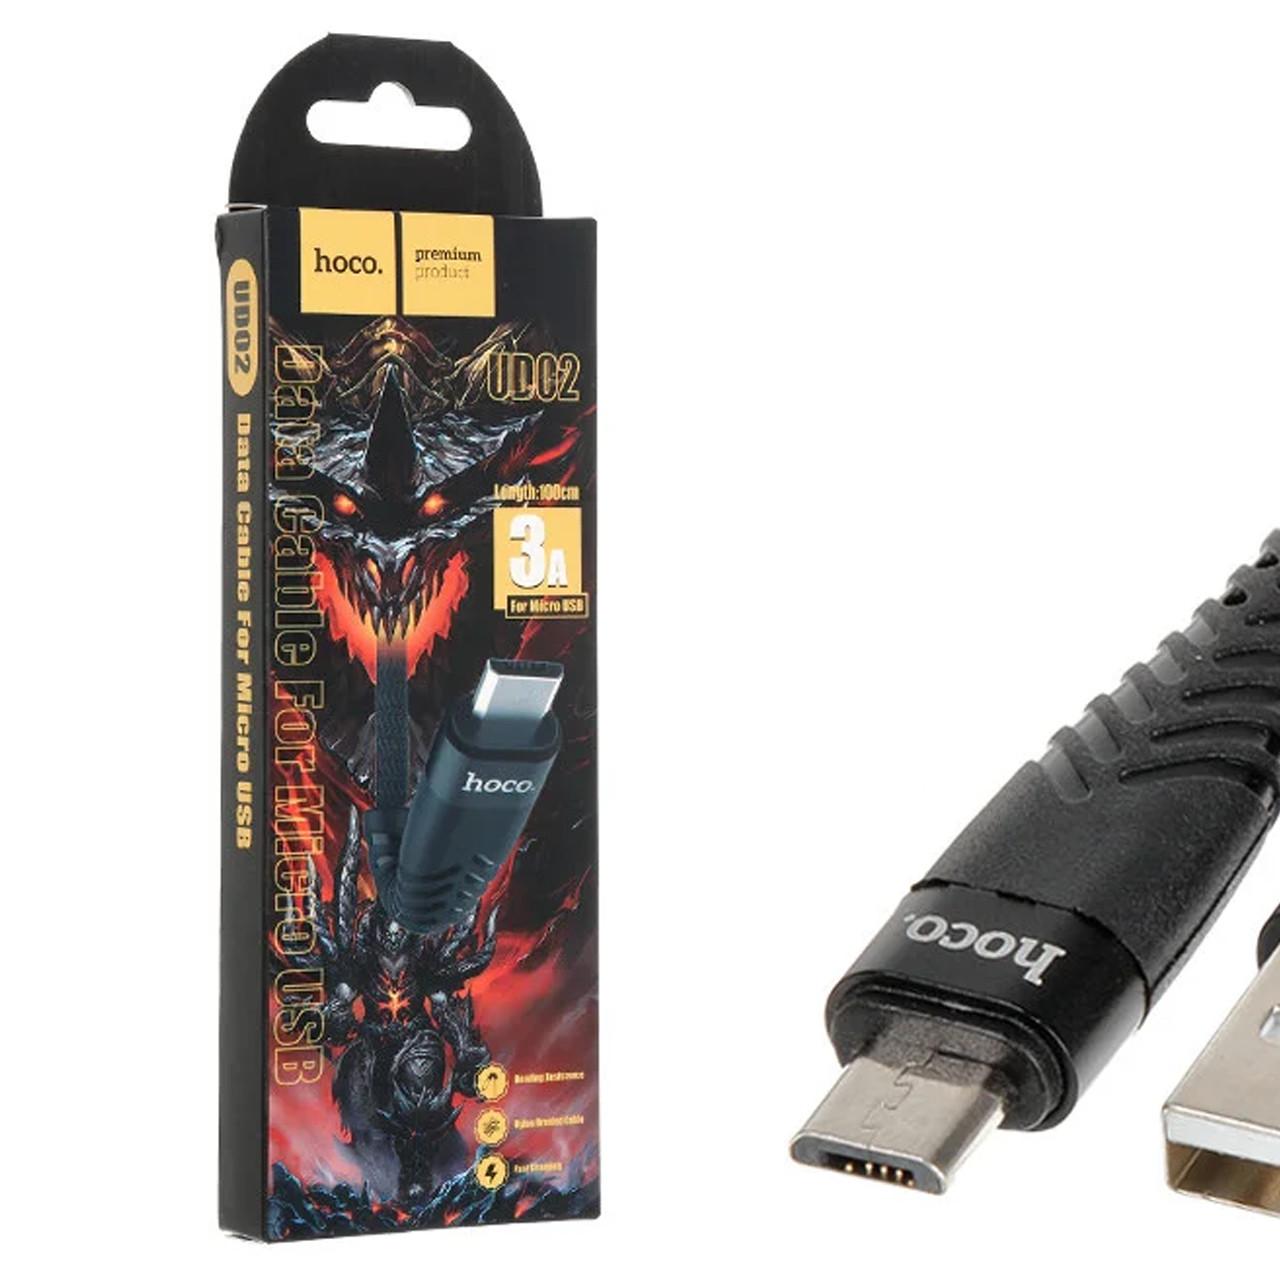 Кабель USB /Micro USB HOCO UD02 Grandiose 2.4 A/1m Black